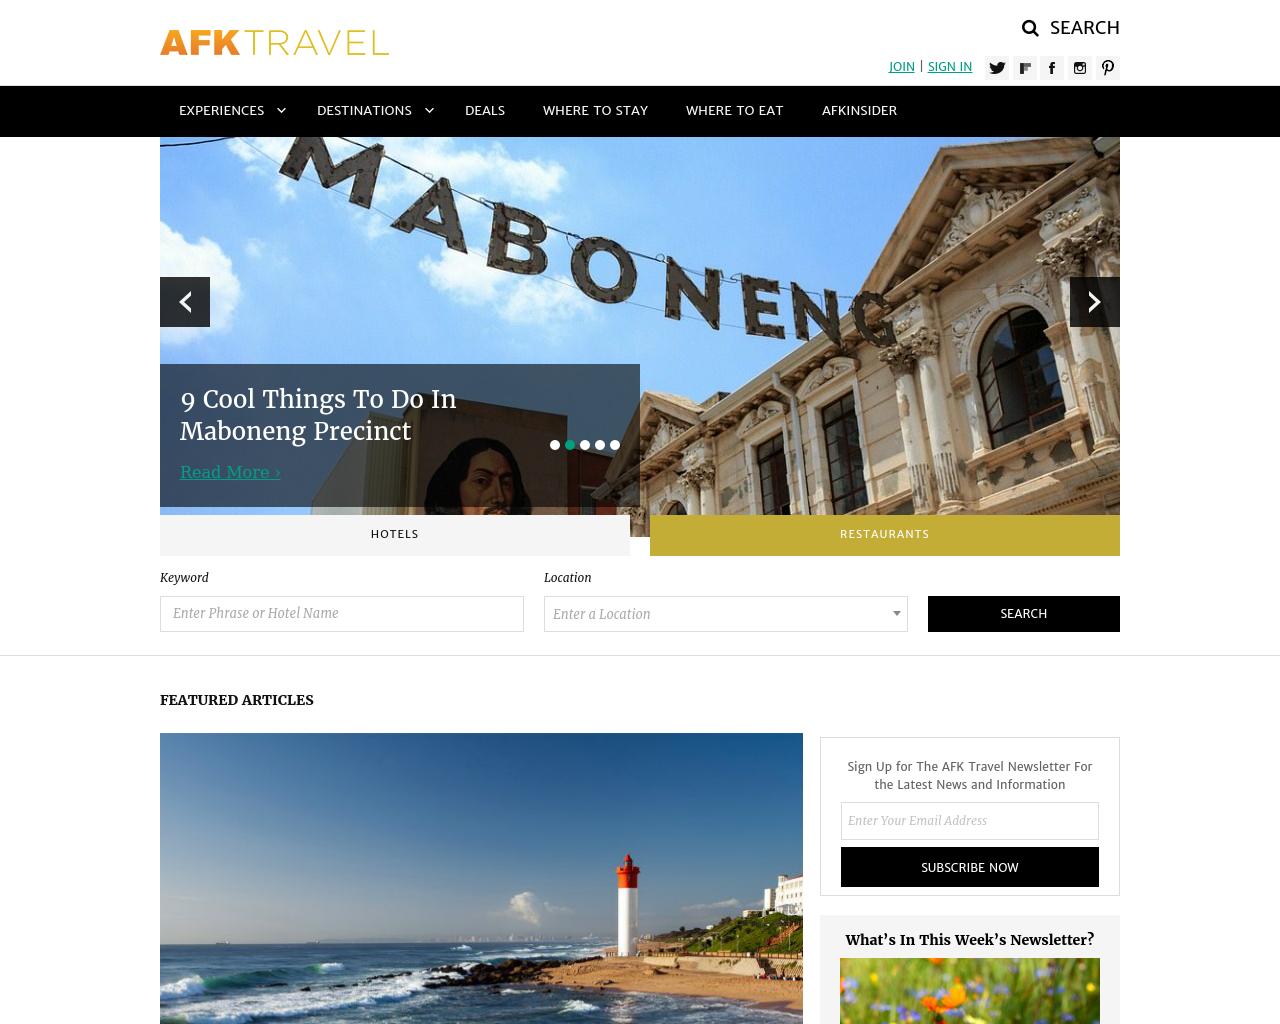 AFK-Travel-Advertising-Reviews-Pricing